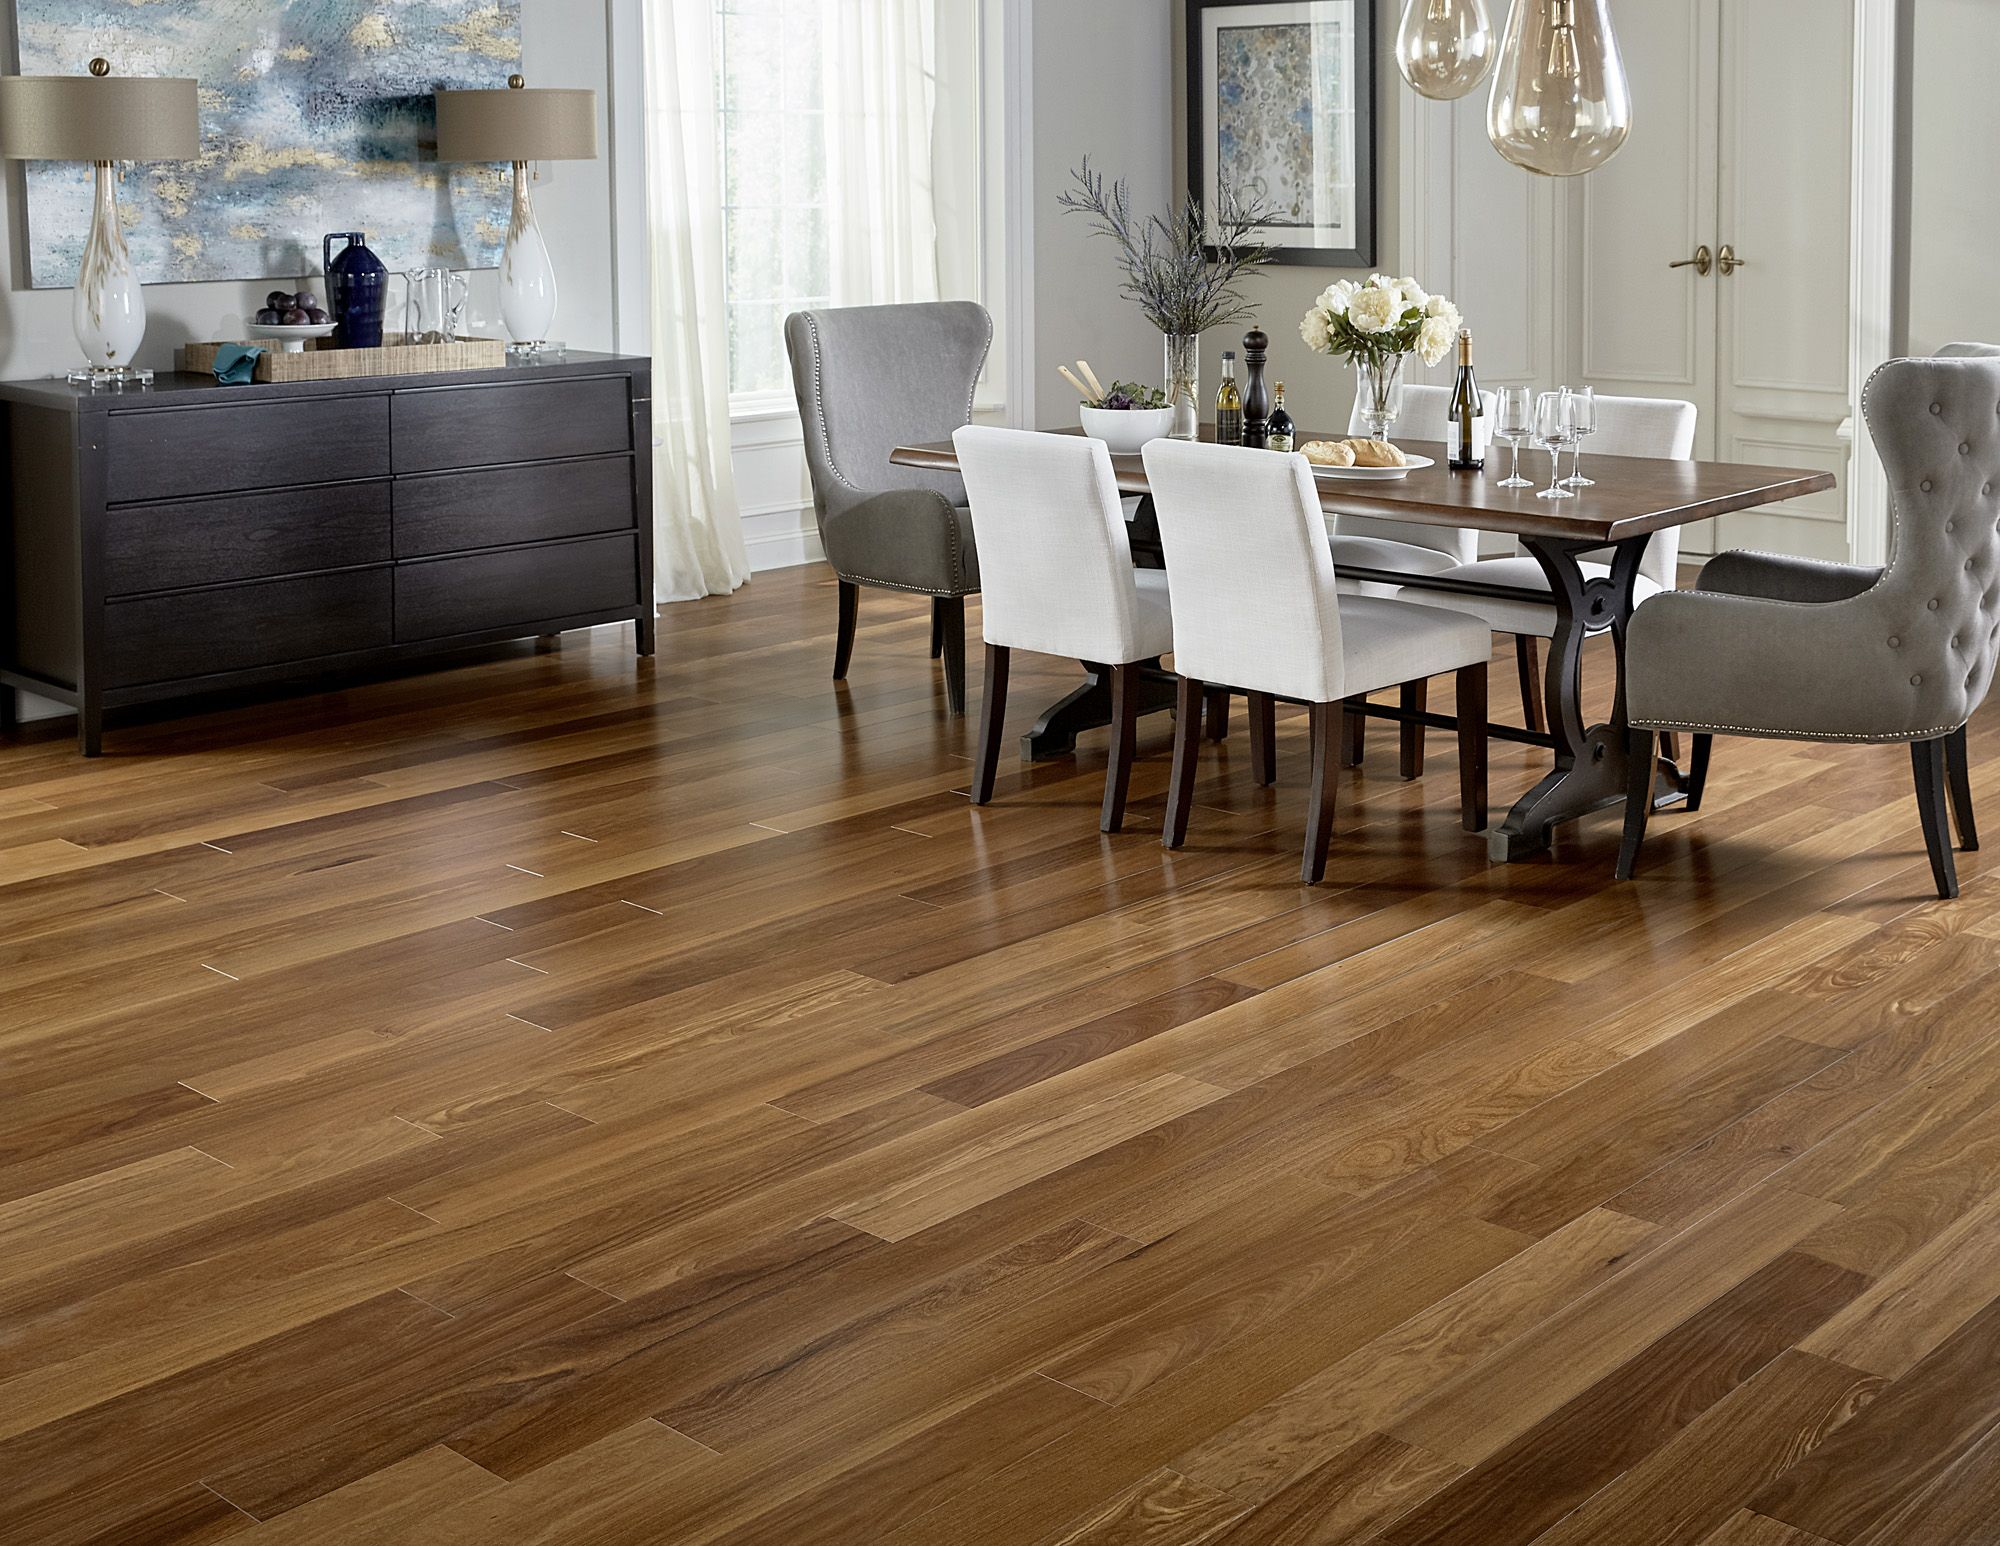 BELLAWOOD Engineered Cumaru Flooring, 1/2 x 51/8, 5.99